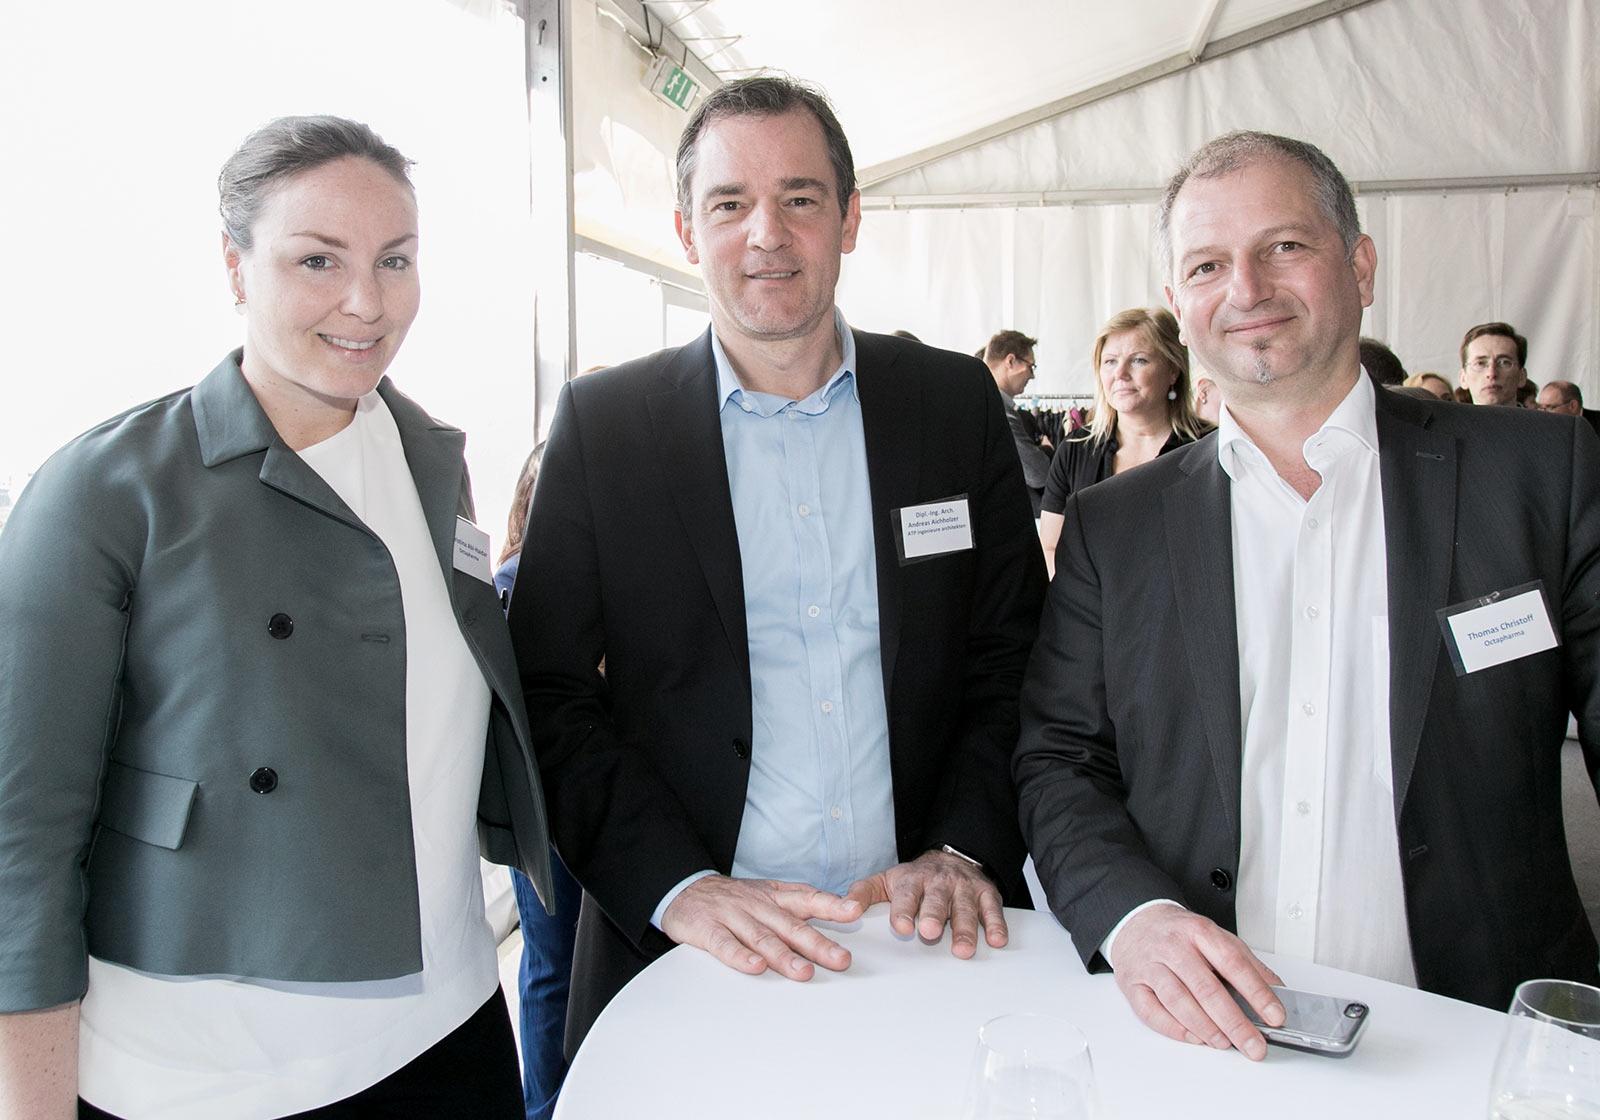 v.l.: Christina Abi-Haidar (Octapharma), Architekt Andreas Aichholzer (ATP) und Thomas Christoff (Octapharma) at the grpundbreaking ceremony. Photo: Octapharma